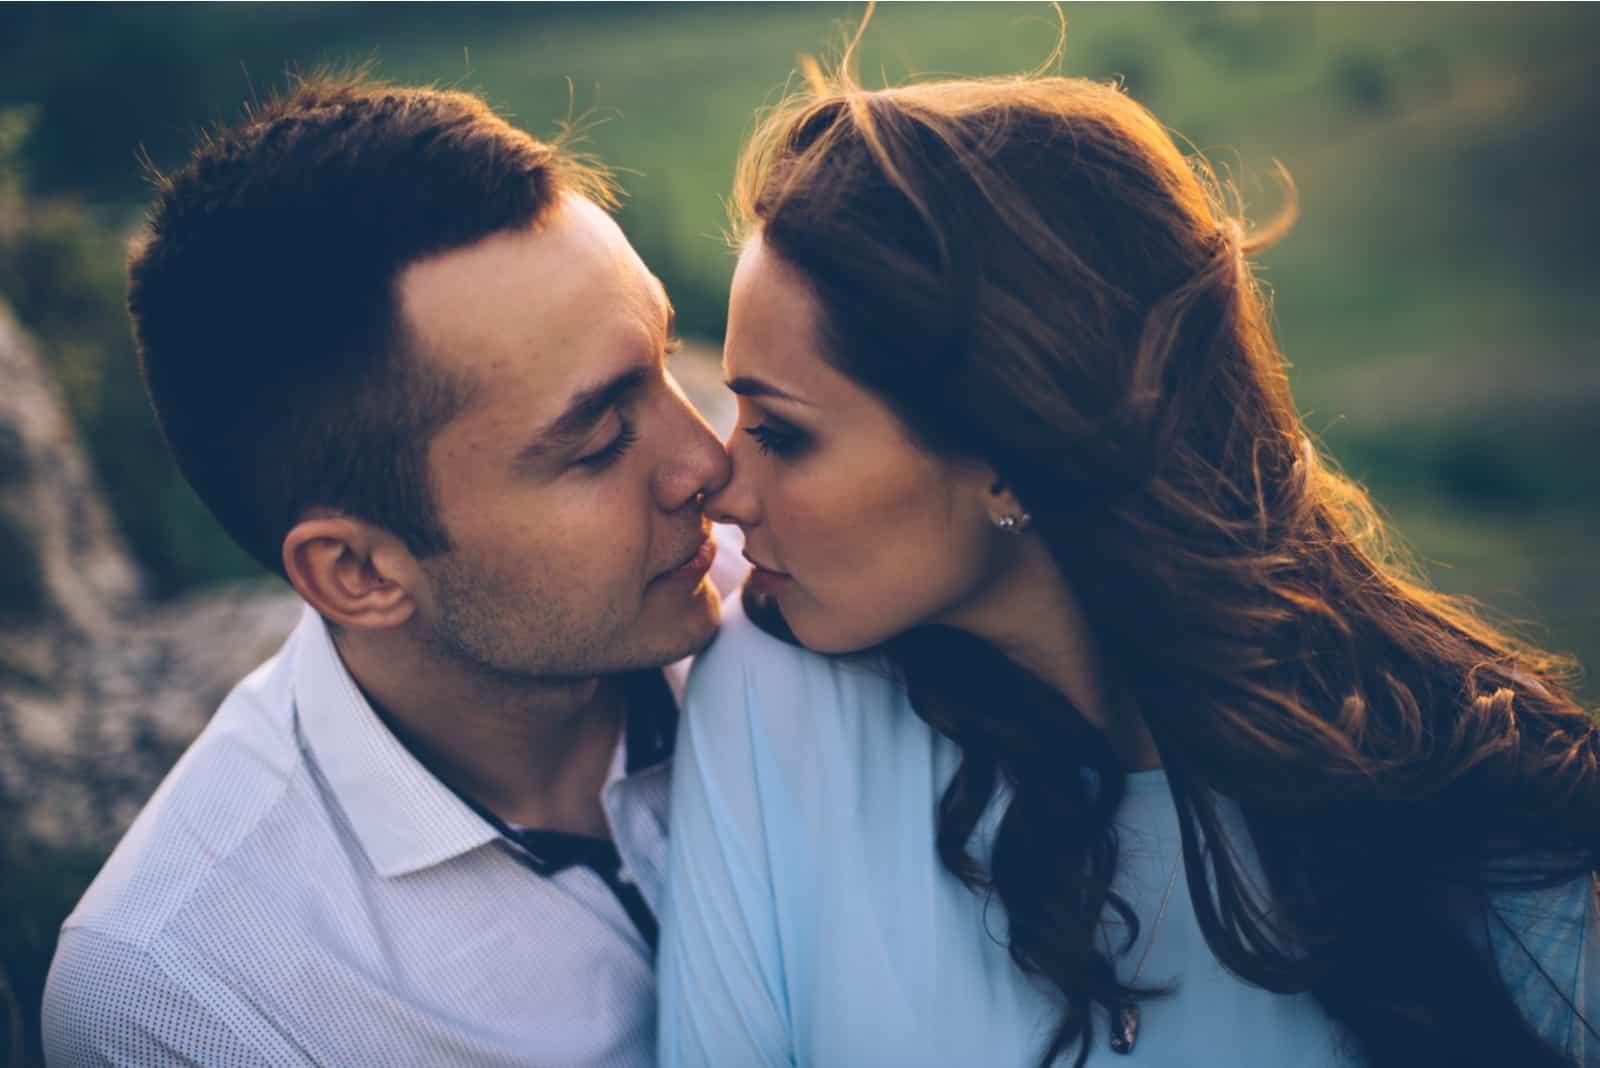 jeune couple câlins en plein air